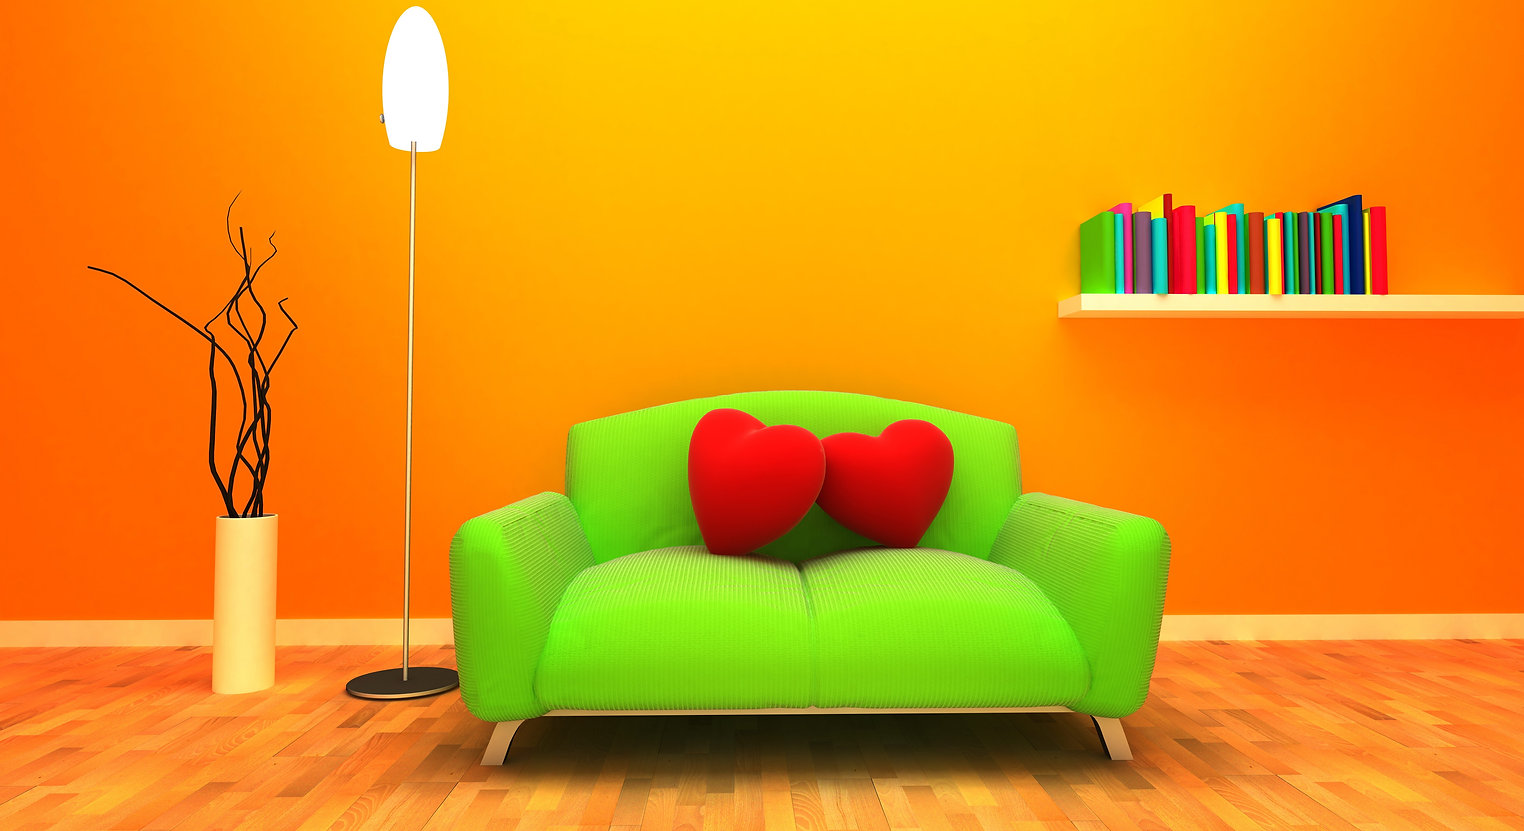 illustration-heart-room-yellow-orange-ci